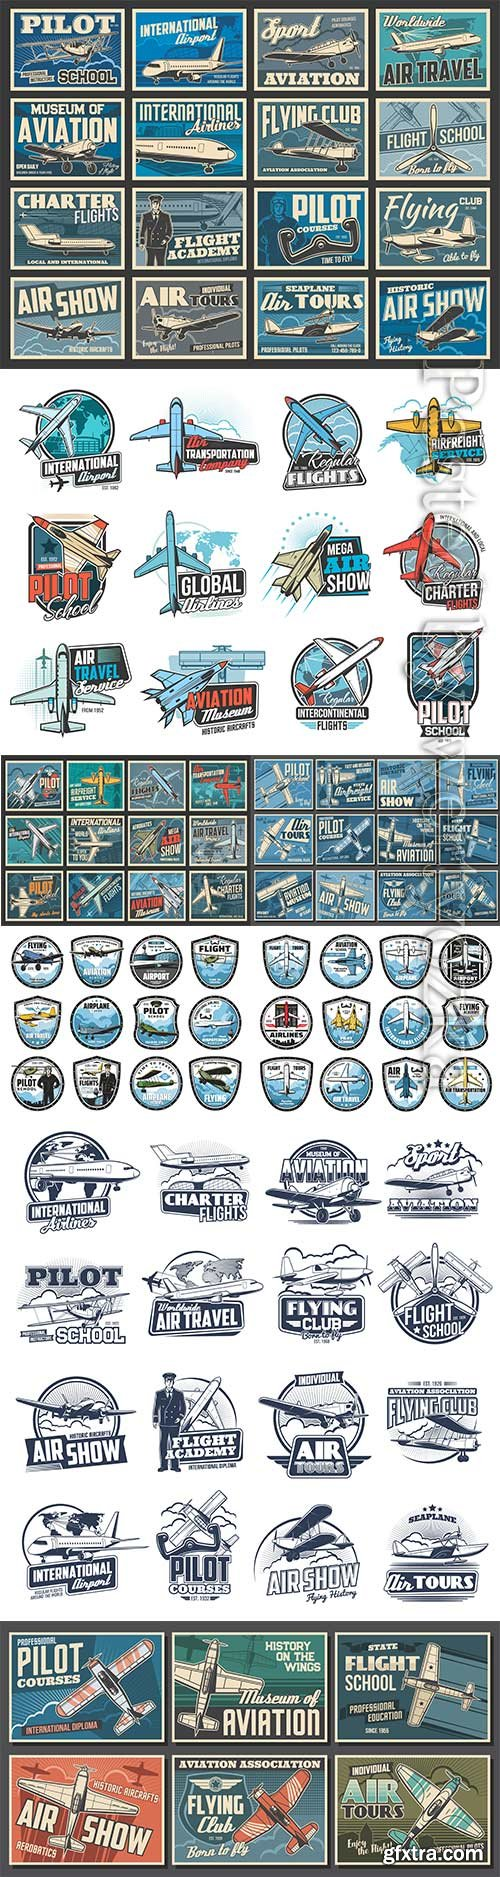 Aviation, air flight icons, airplane pilot school